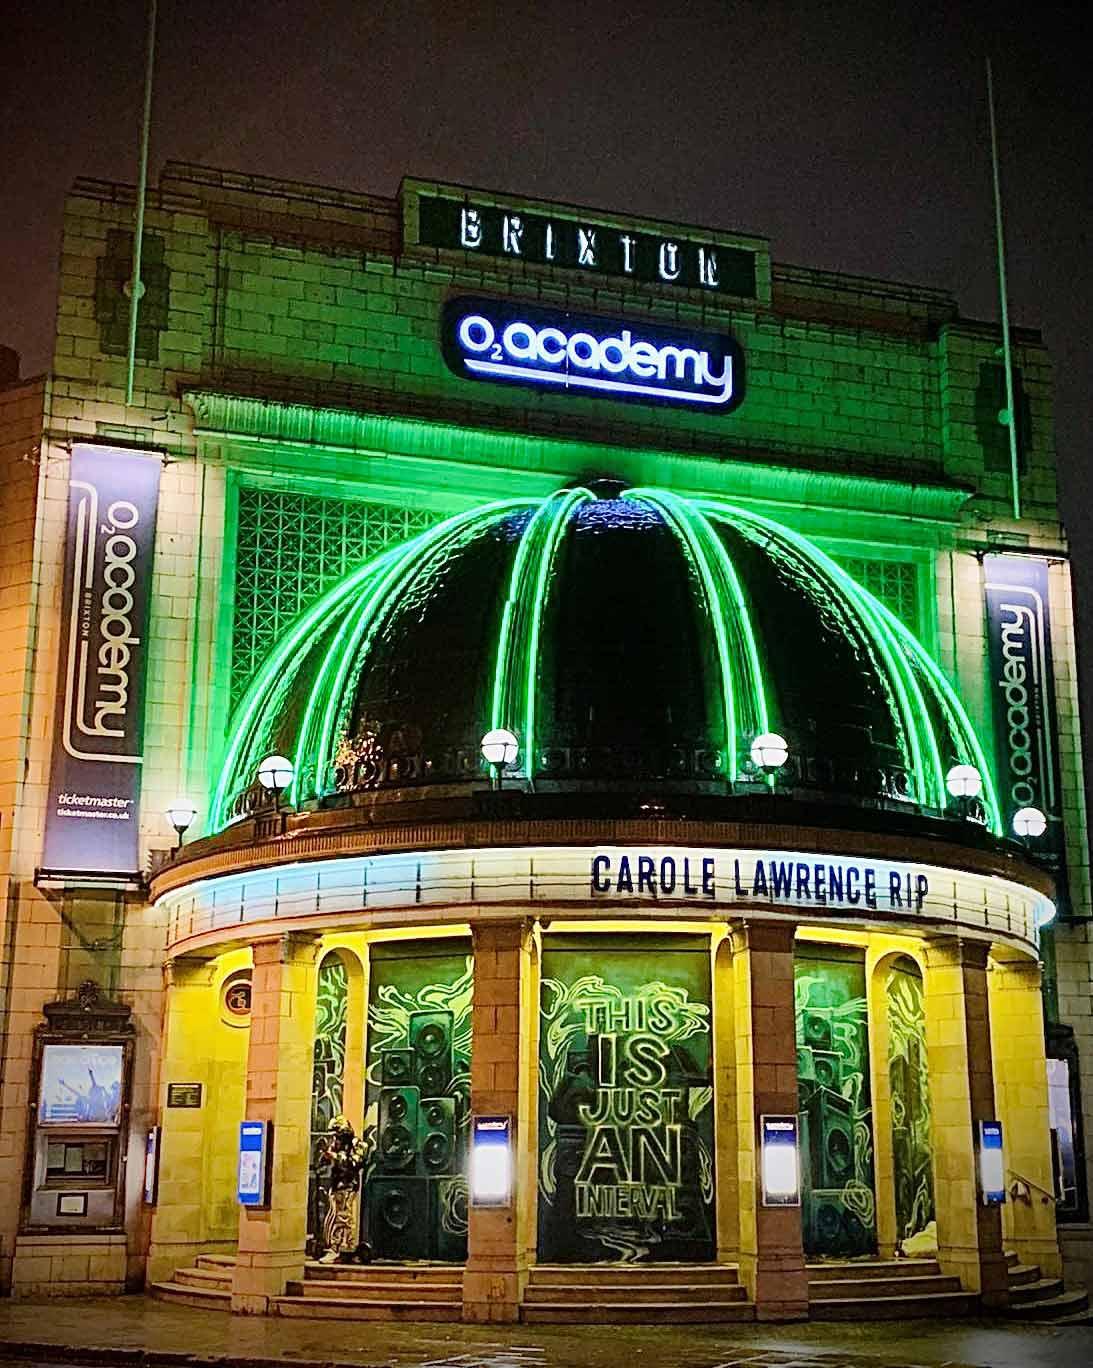 O2 Academy Brixton at night